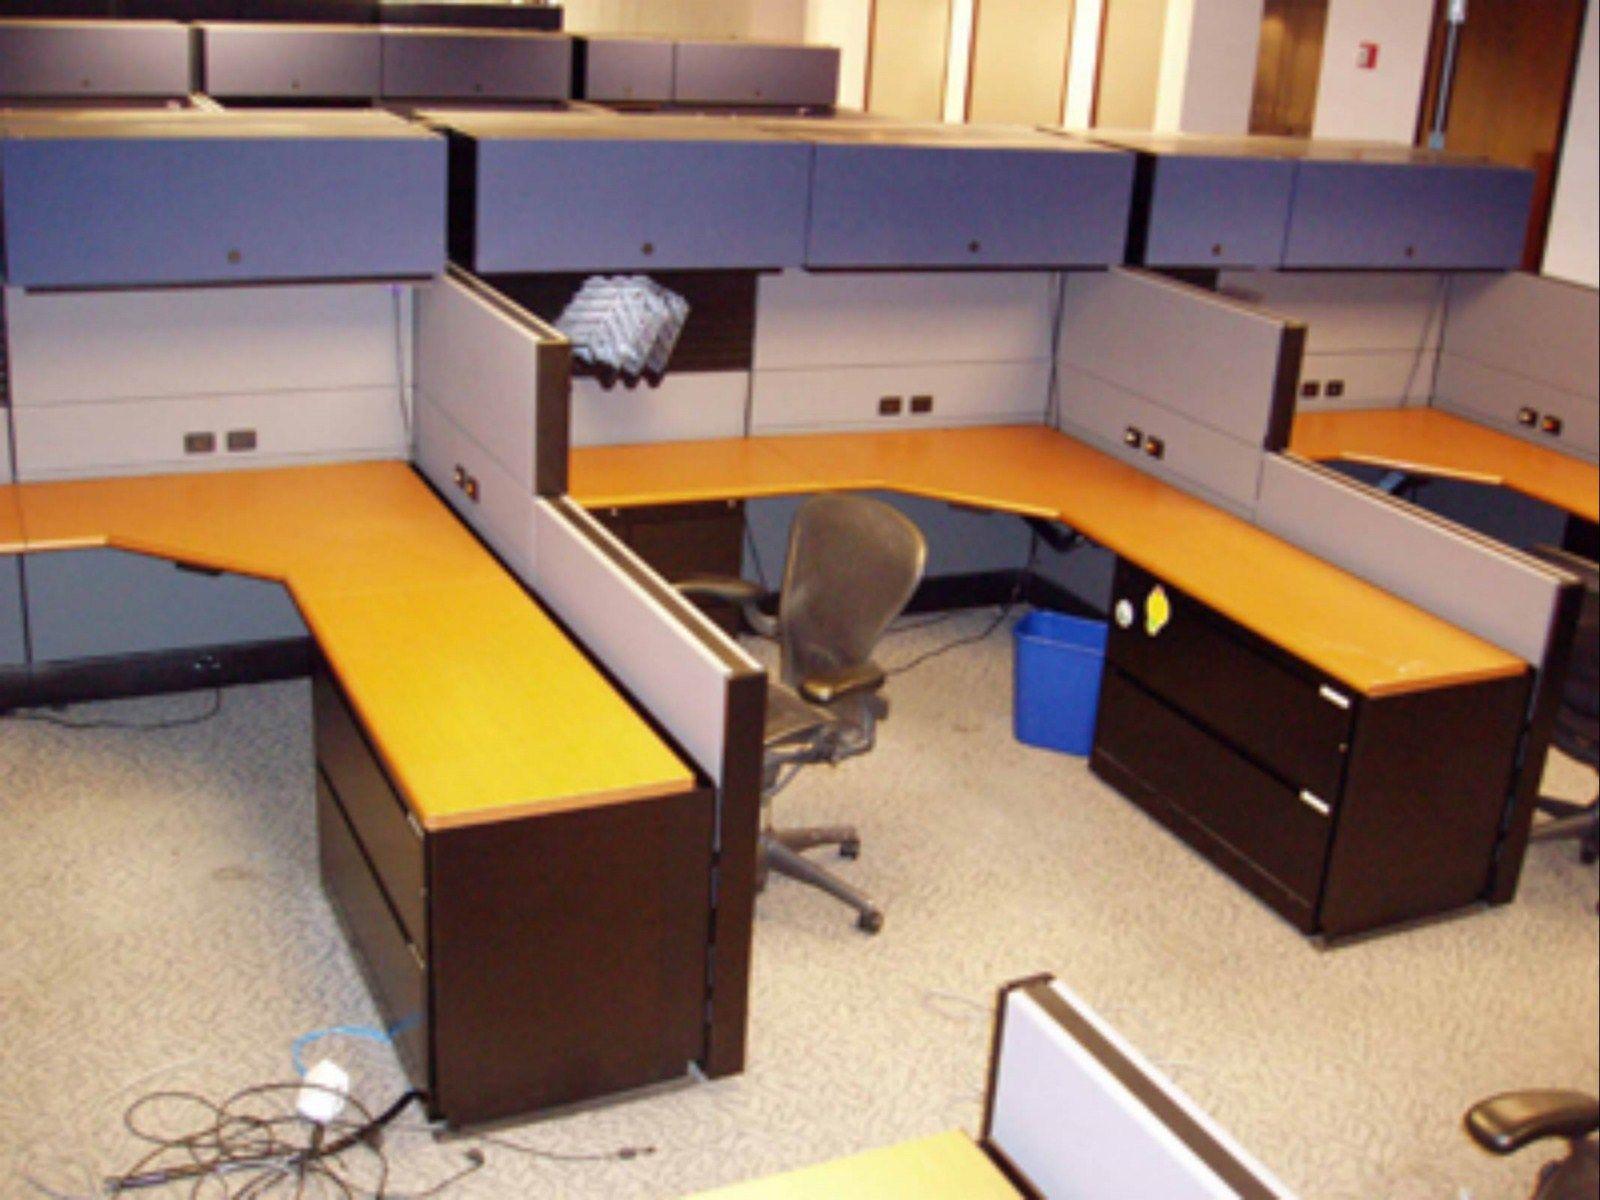 Büromöbel Discount Büromöbel Nyc - Bürozubehör | BüroMöbel | Pinterest